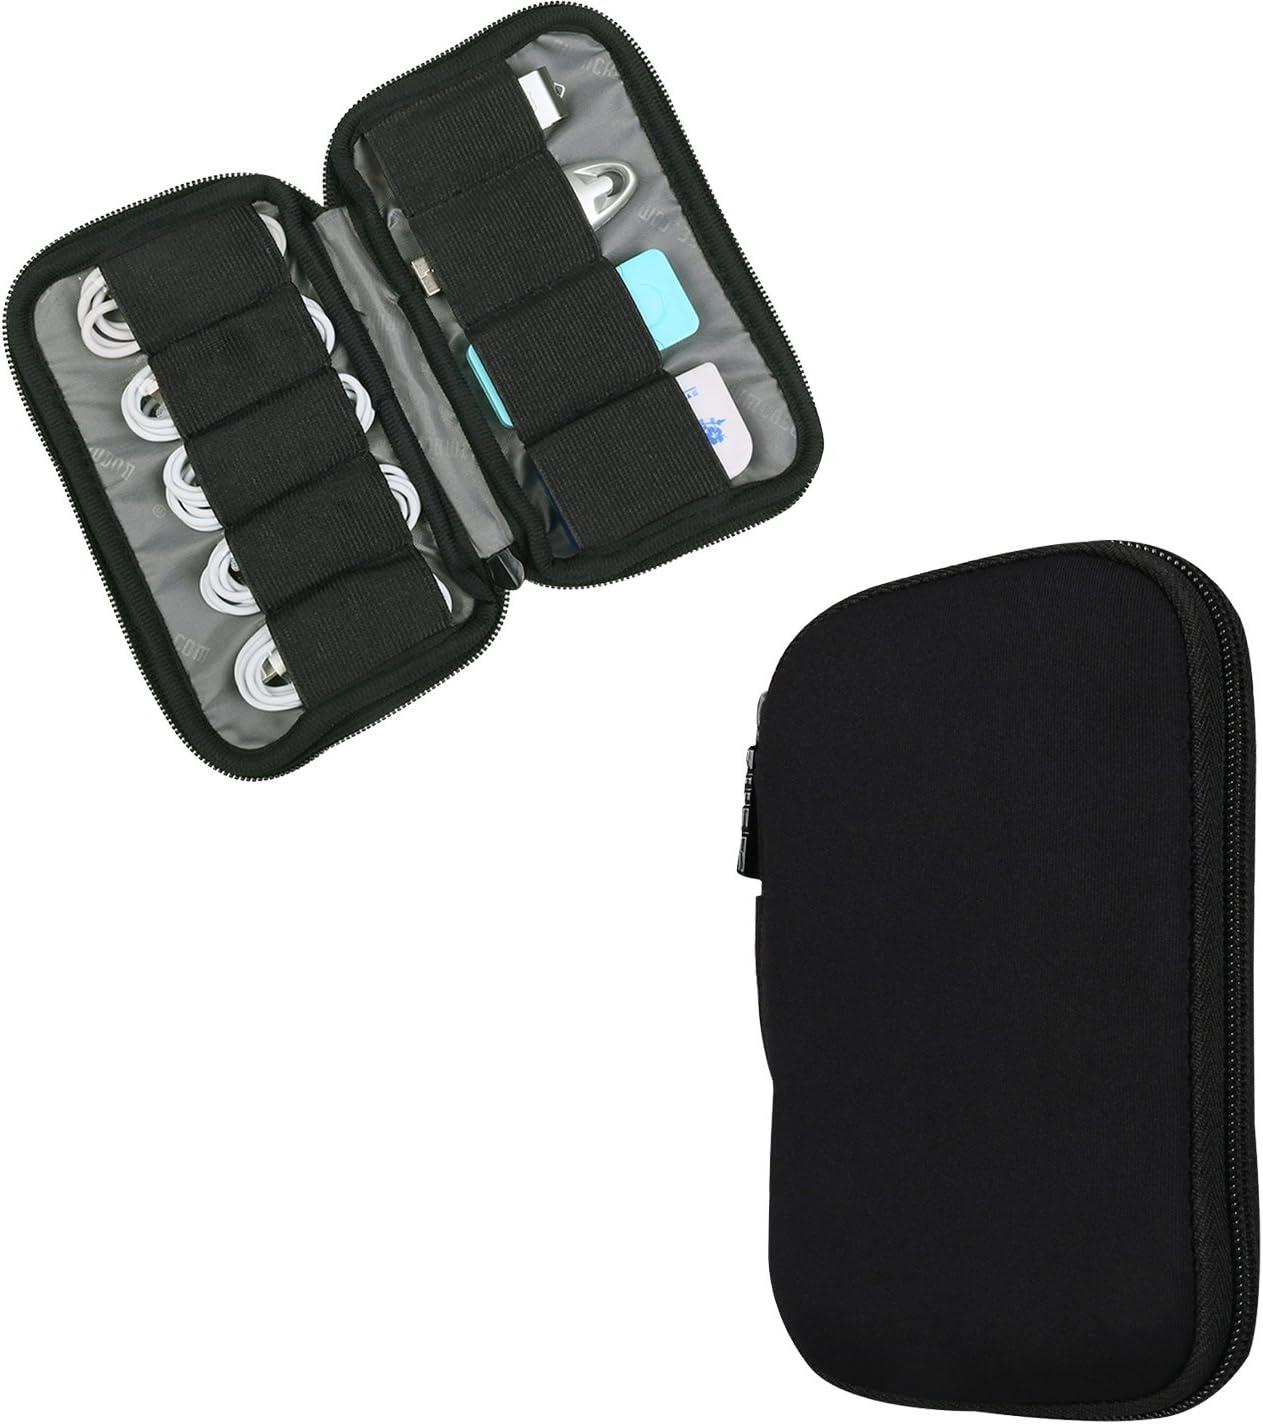 BUBM Soft 9 USB Drive Shuttle 9-Capacity Case